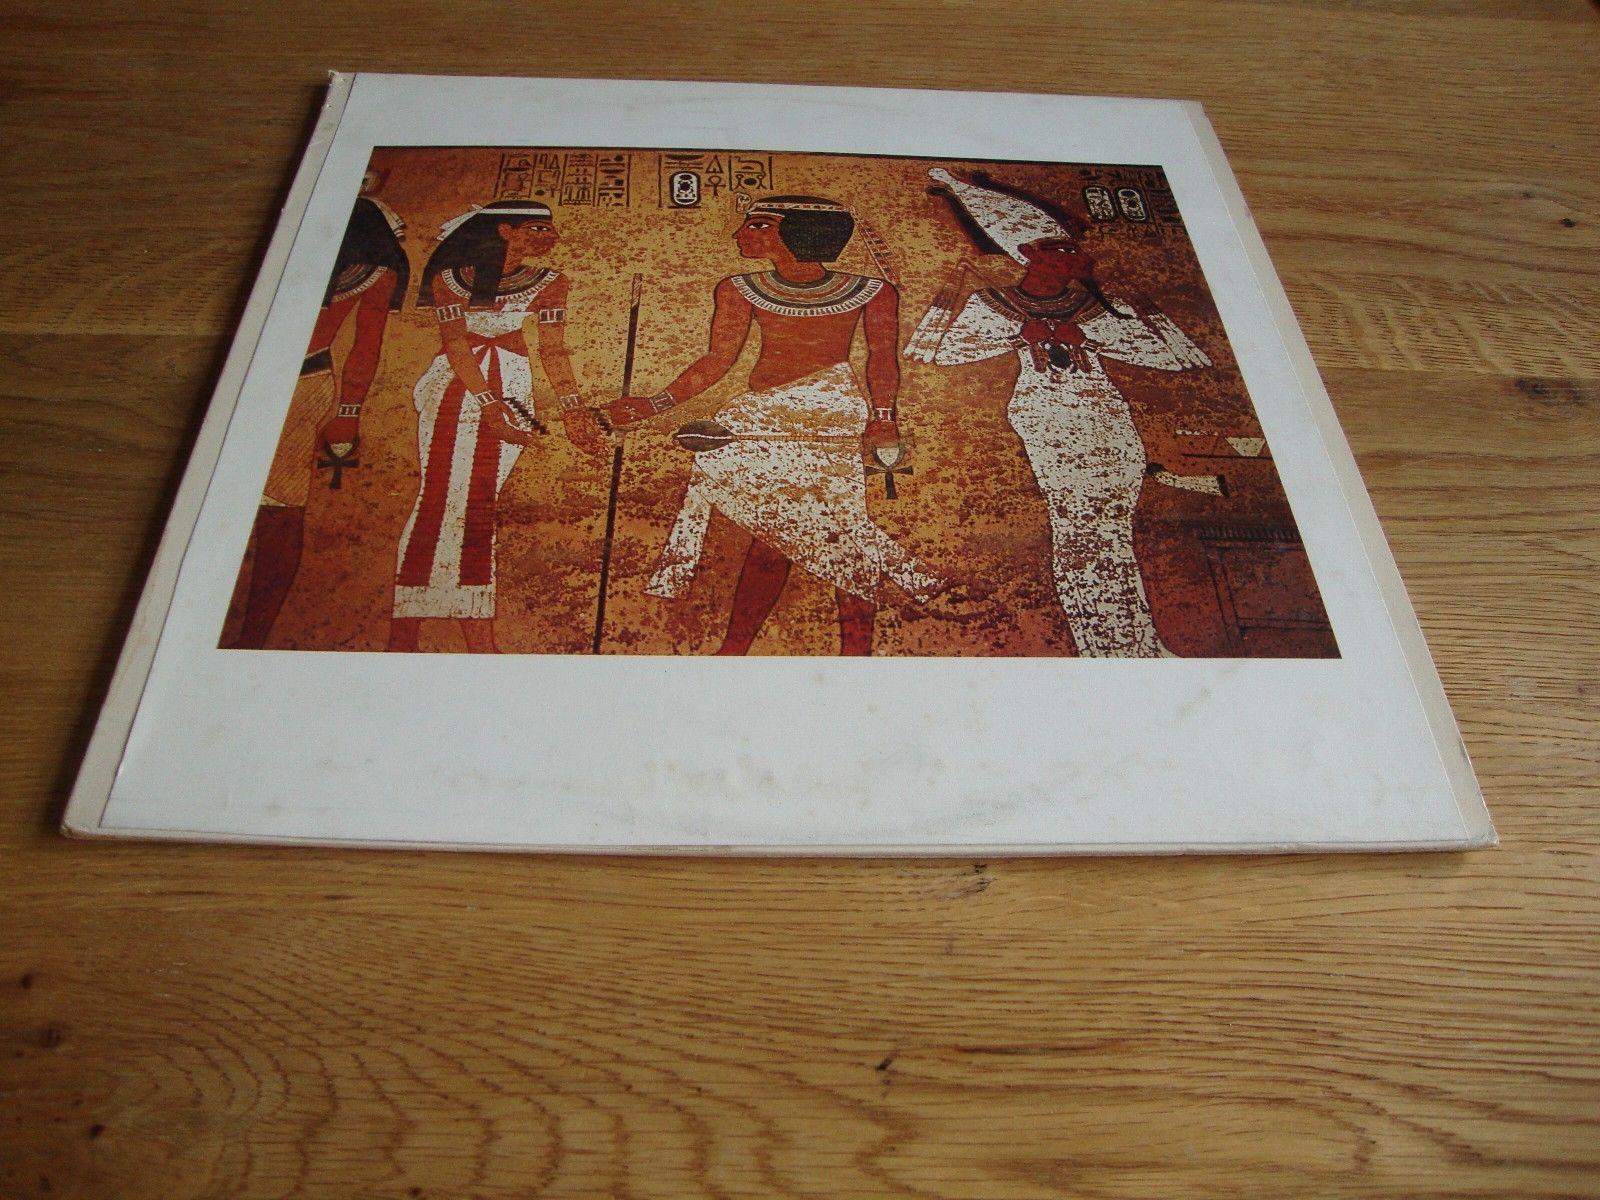 Sun Ra  and His Arkestra Vinyl Album Saturn Records - The Sound Mirror